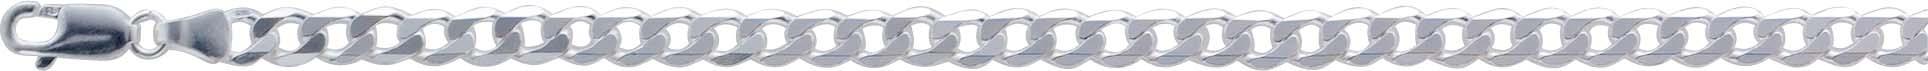 UNO A ERRE Panzerkette Panzerarmband Herrenkette Herrenarmband Silberkette 925 Halskette 925 5mm 18 256477118